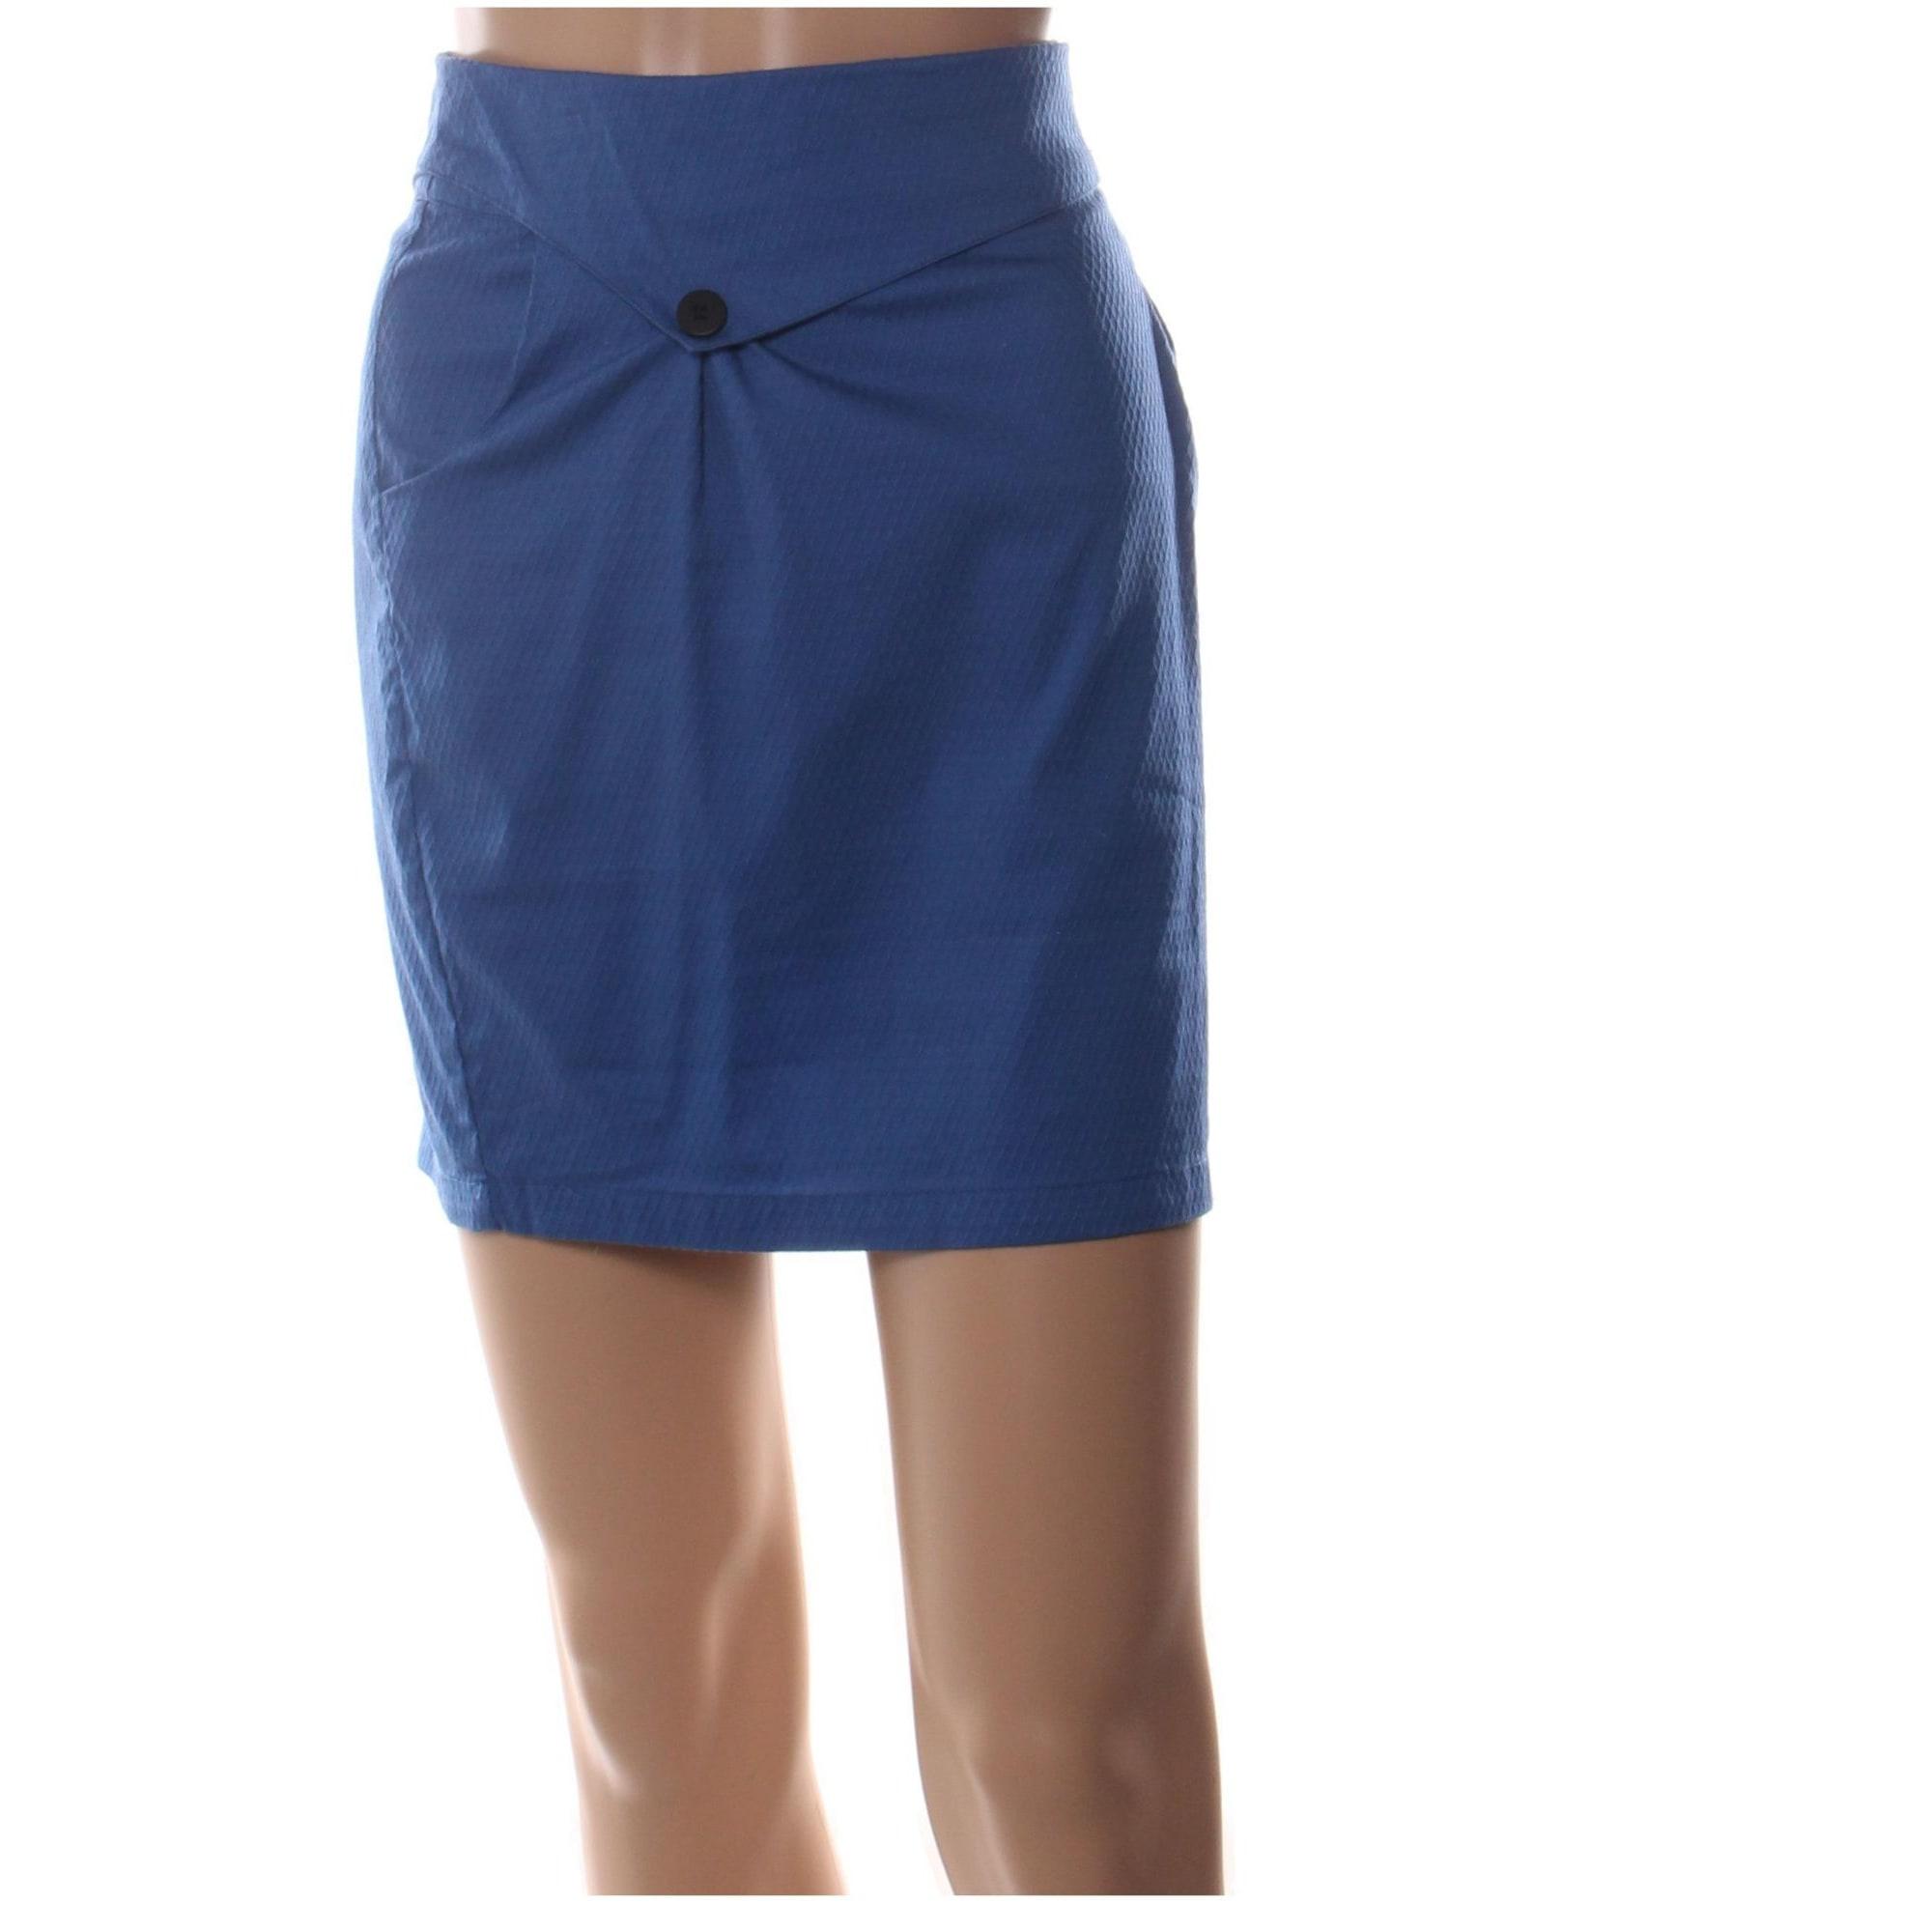 Jupe courte SKUNK FUNK Bleu, bleu marine, bleu turquoise